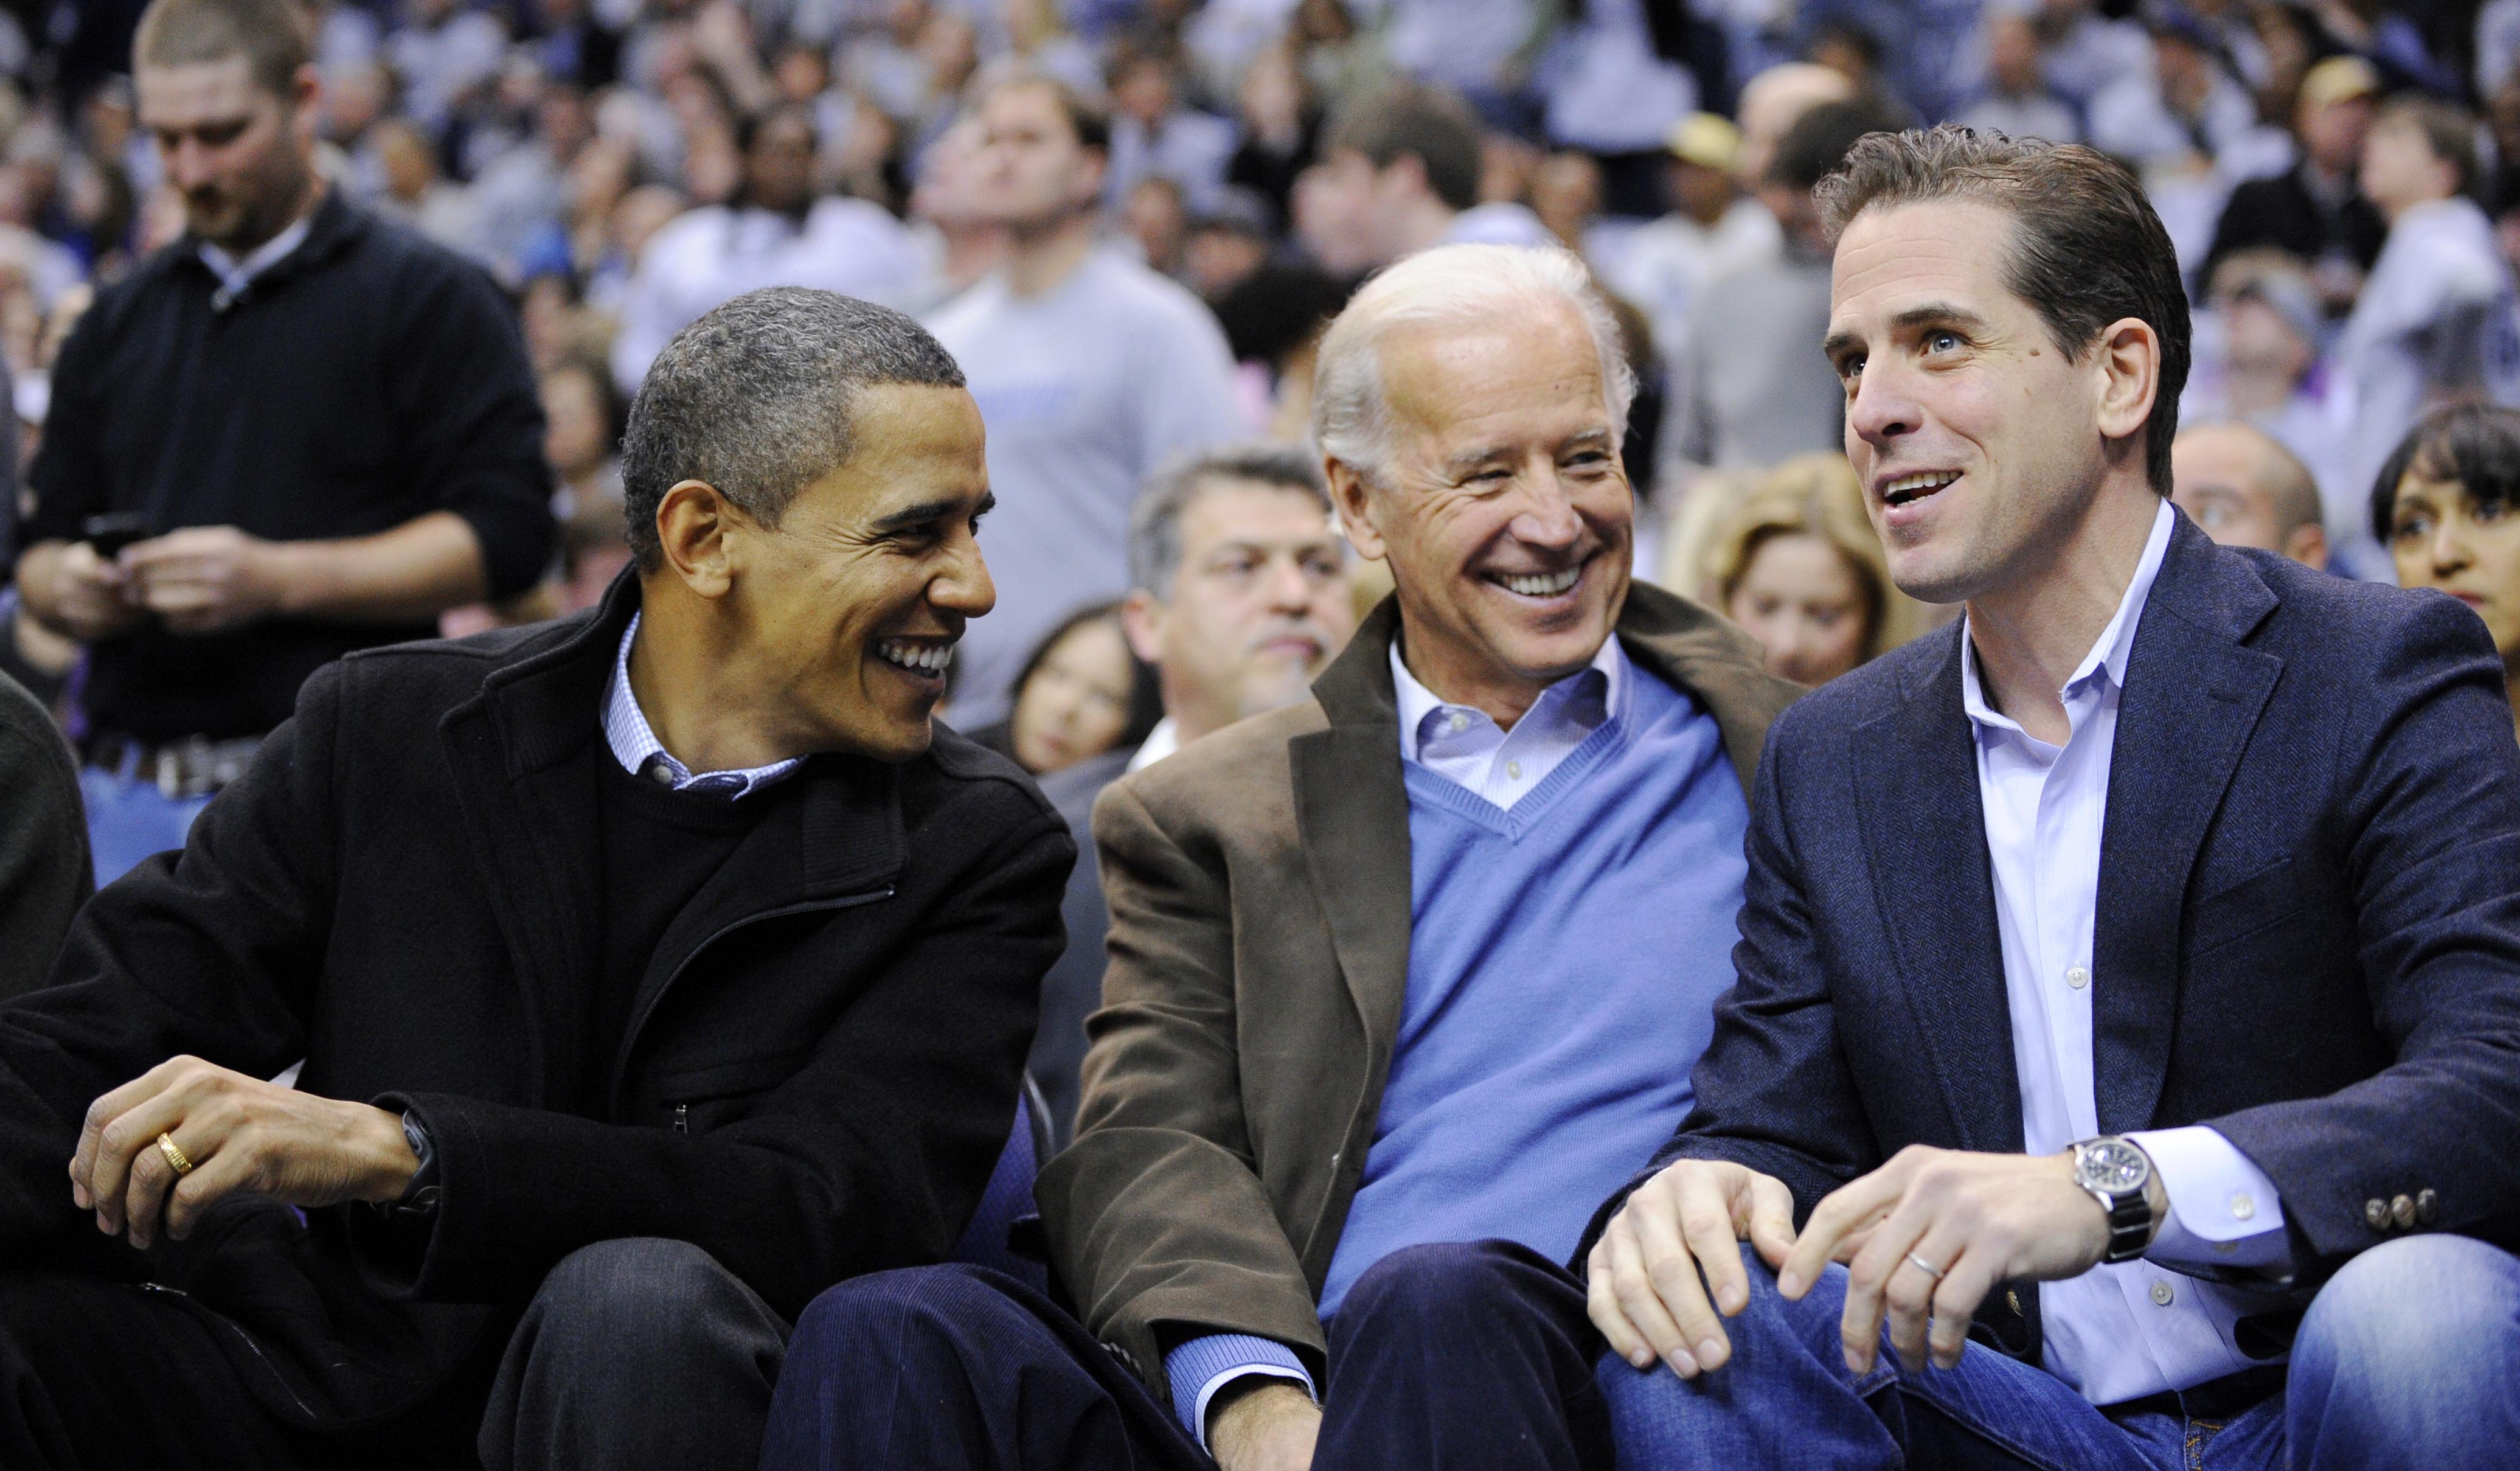 Most want Hunter Biden investigated